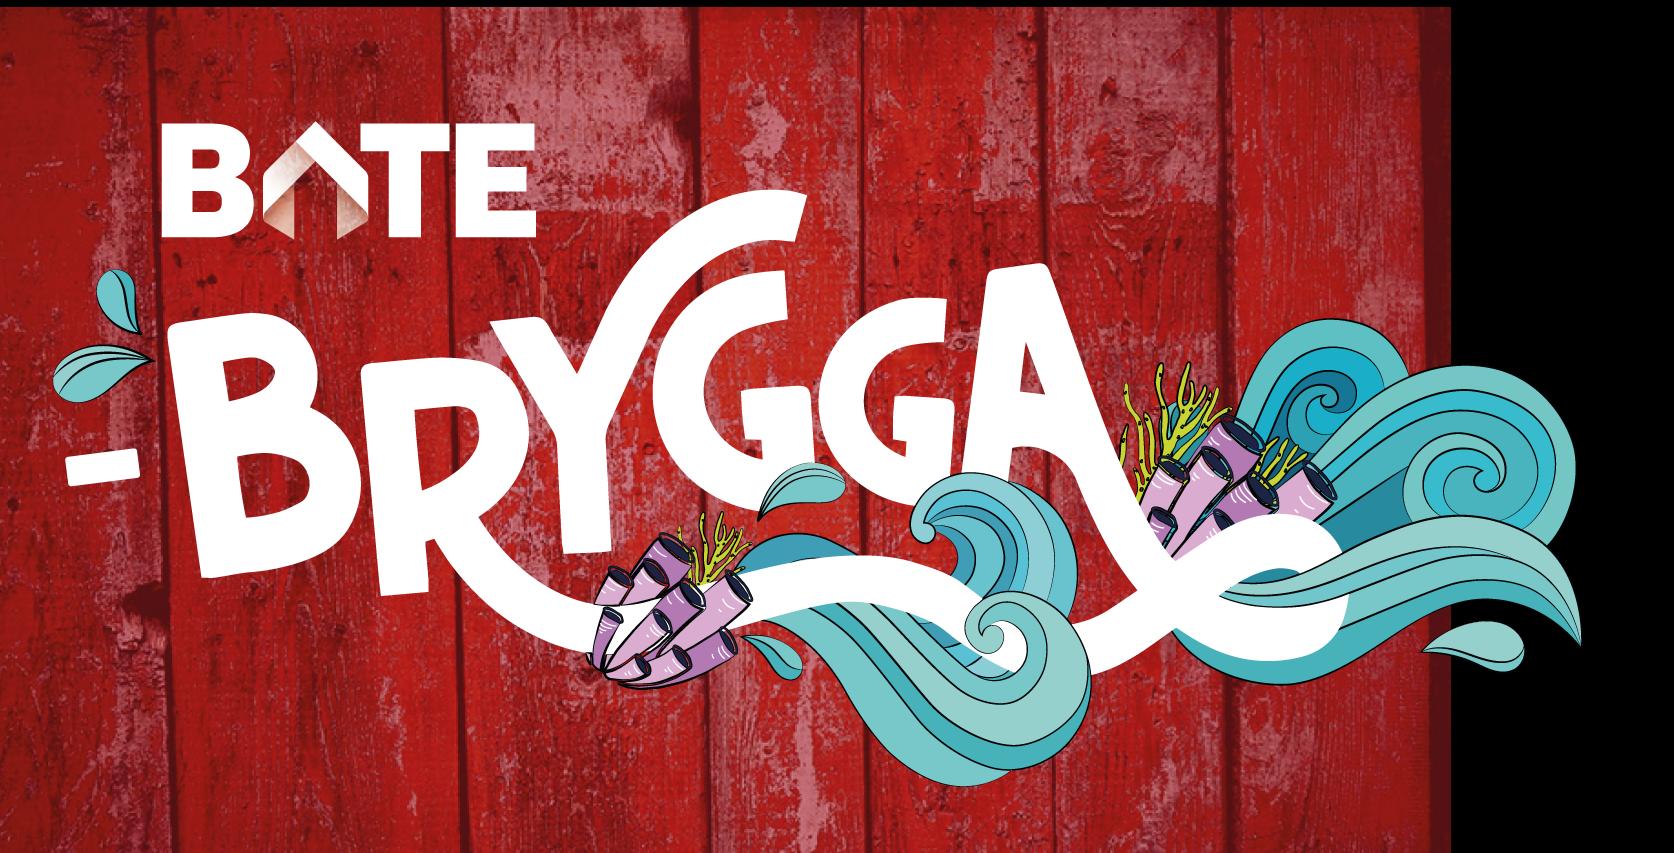 BateBrygga Logofil-01